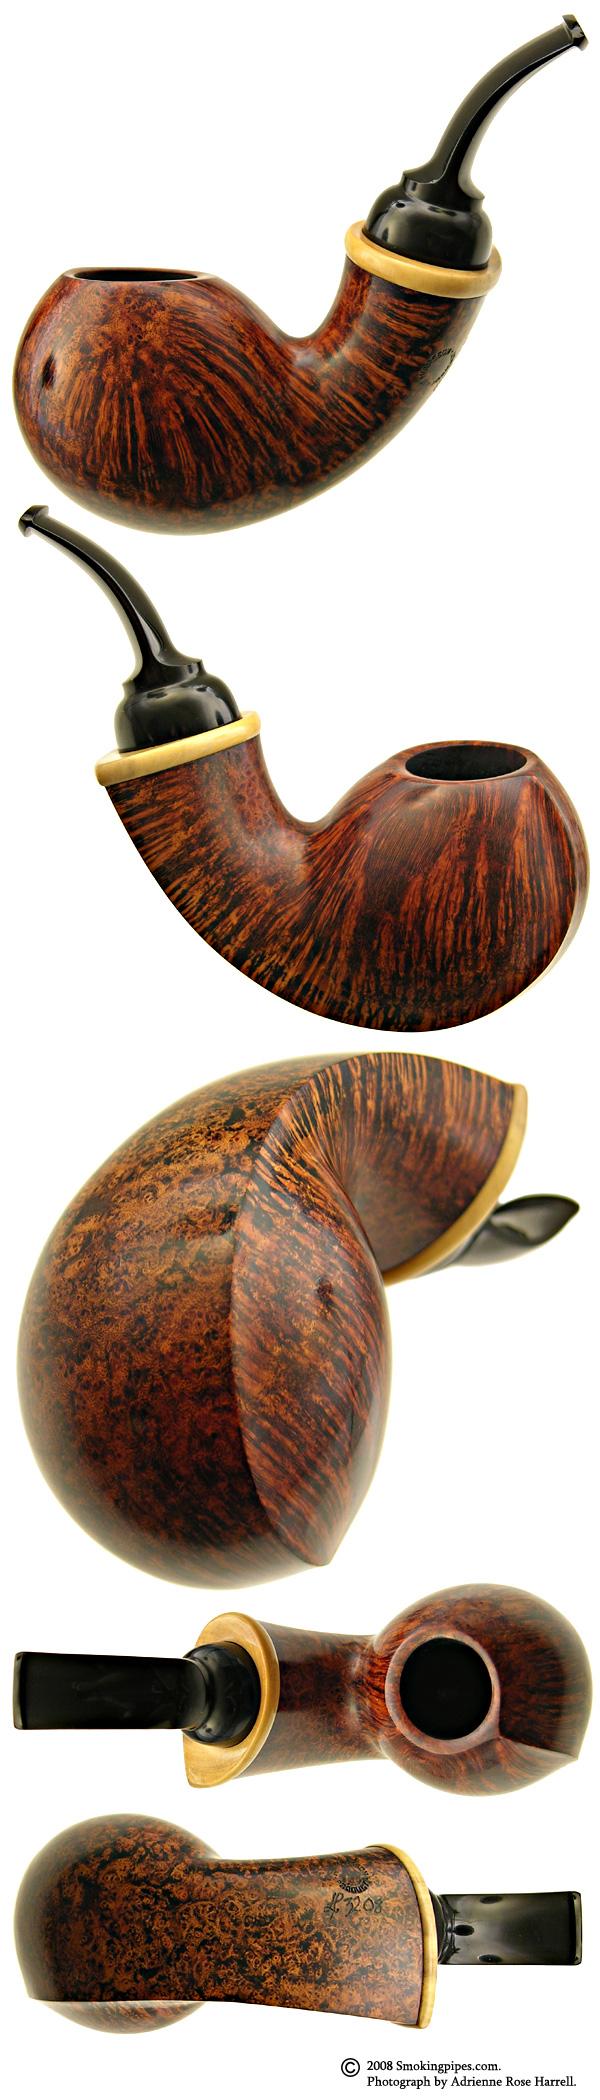 Lars Ivarsson Smooth Blowfish with Boxwood (3208)